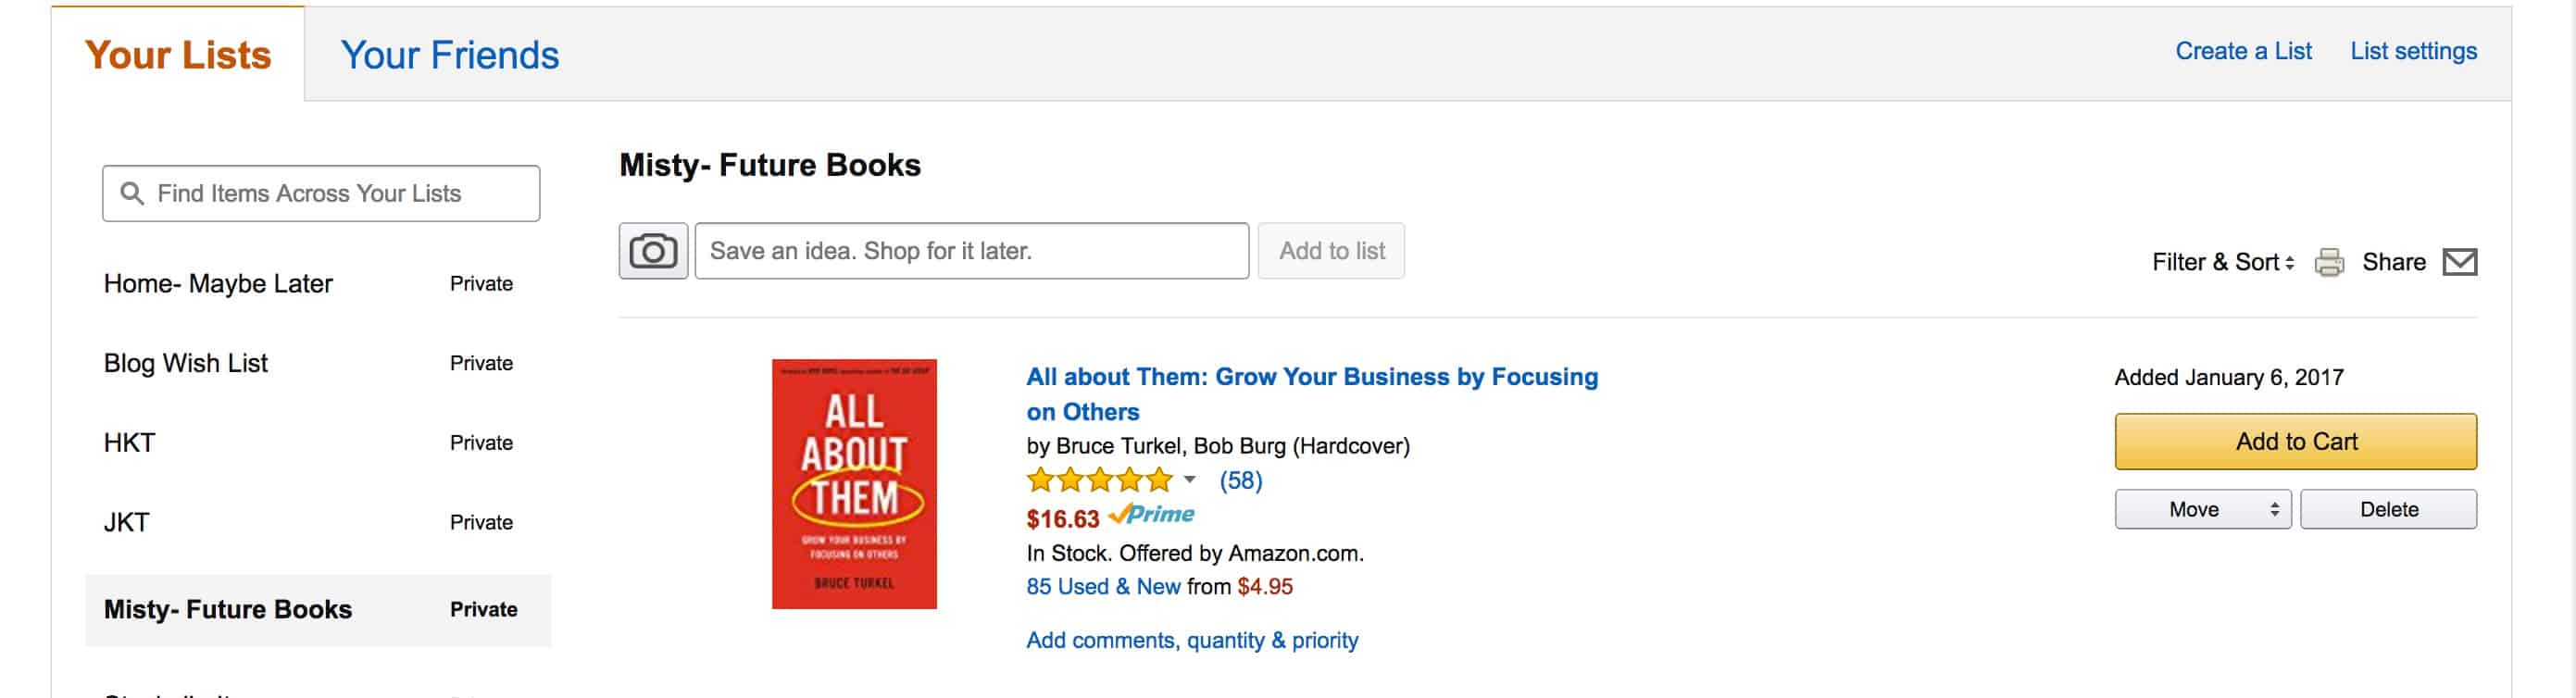 Amazon Future books list example